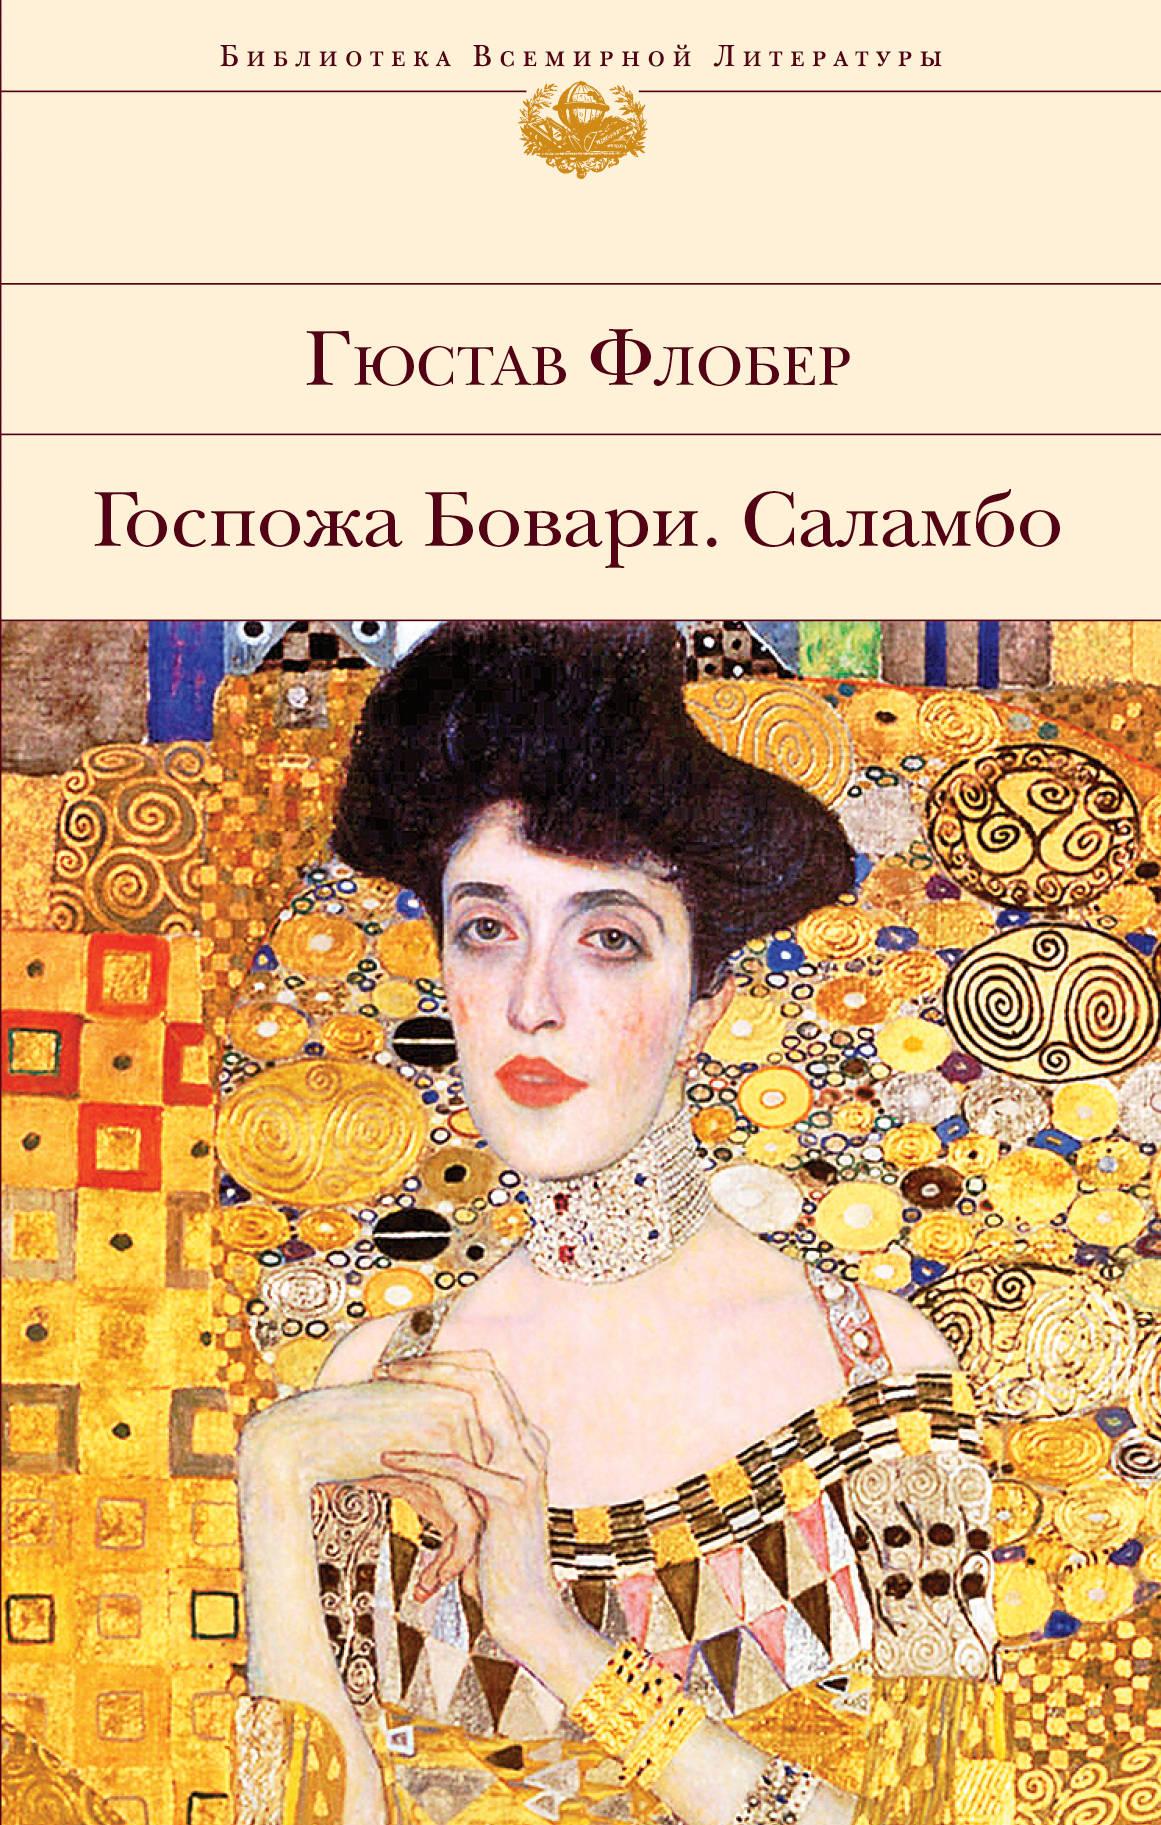 Gospozha Bovari. Salambo